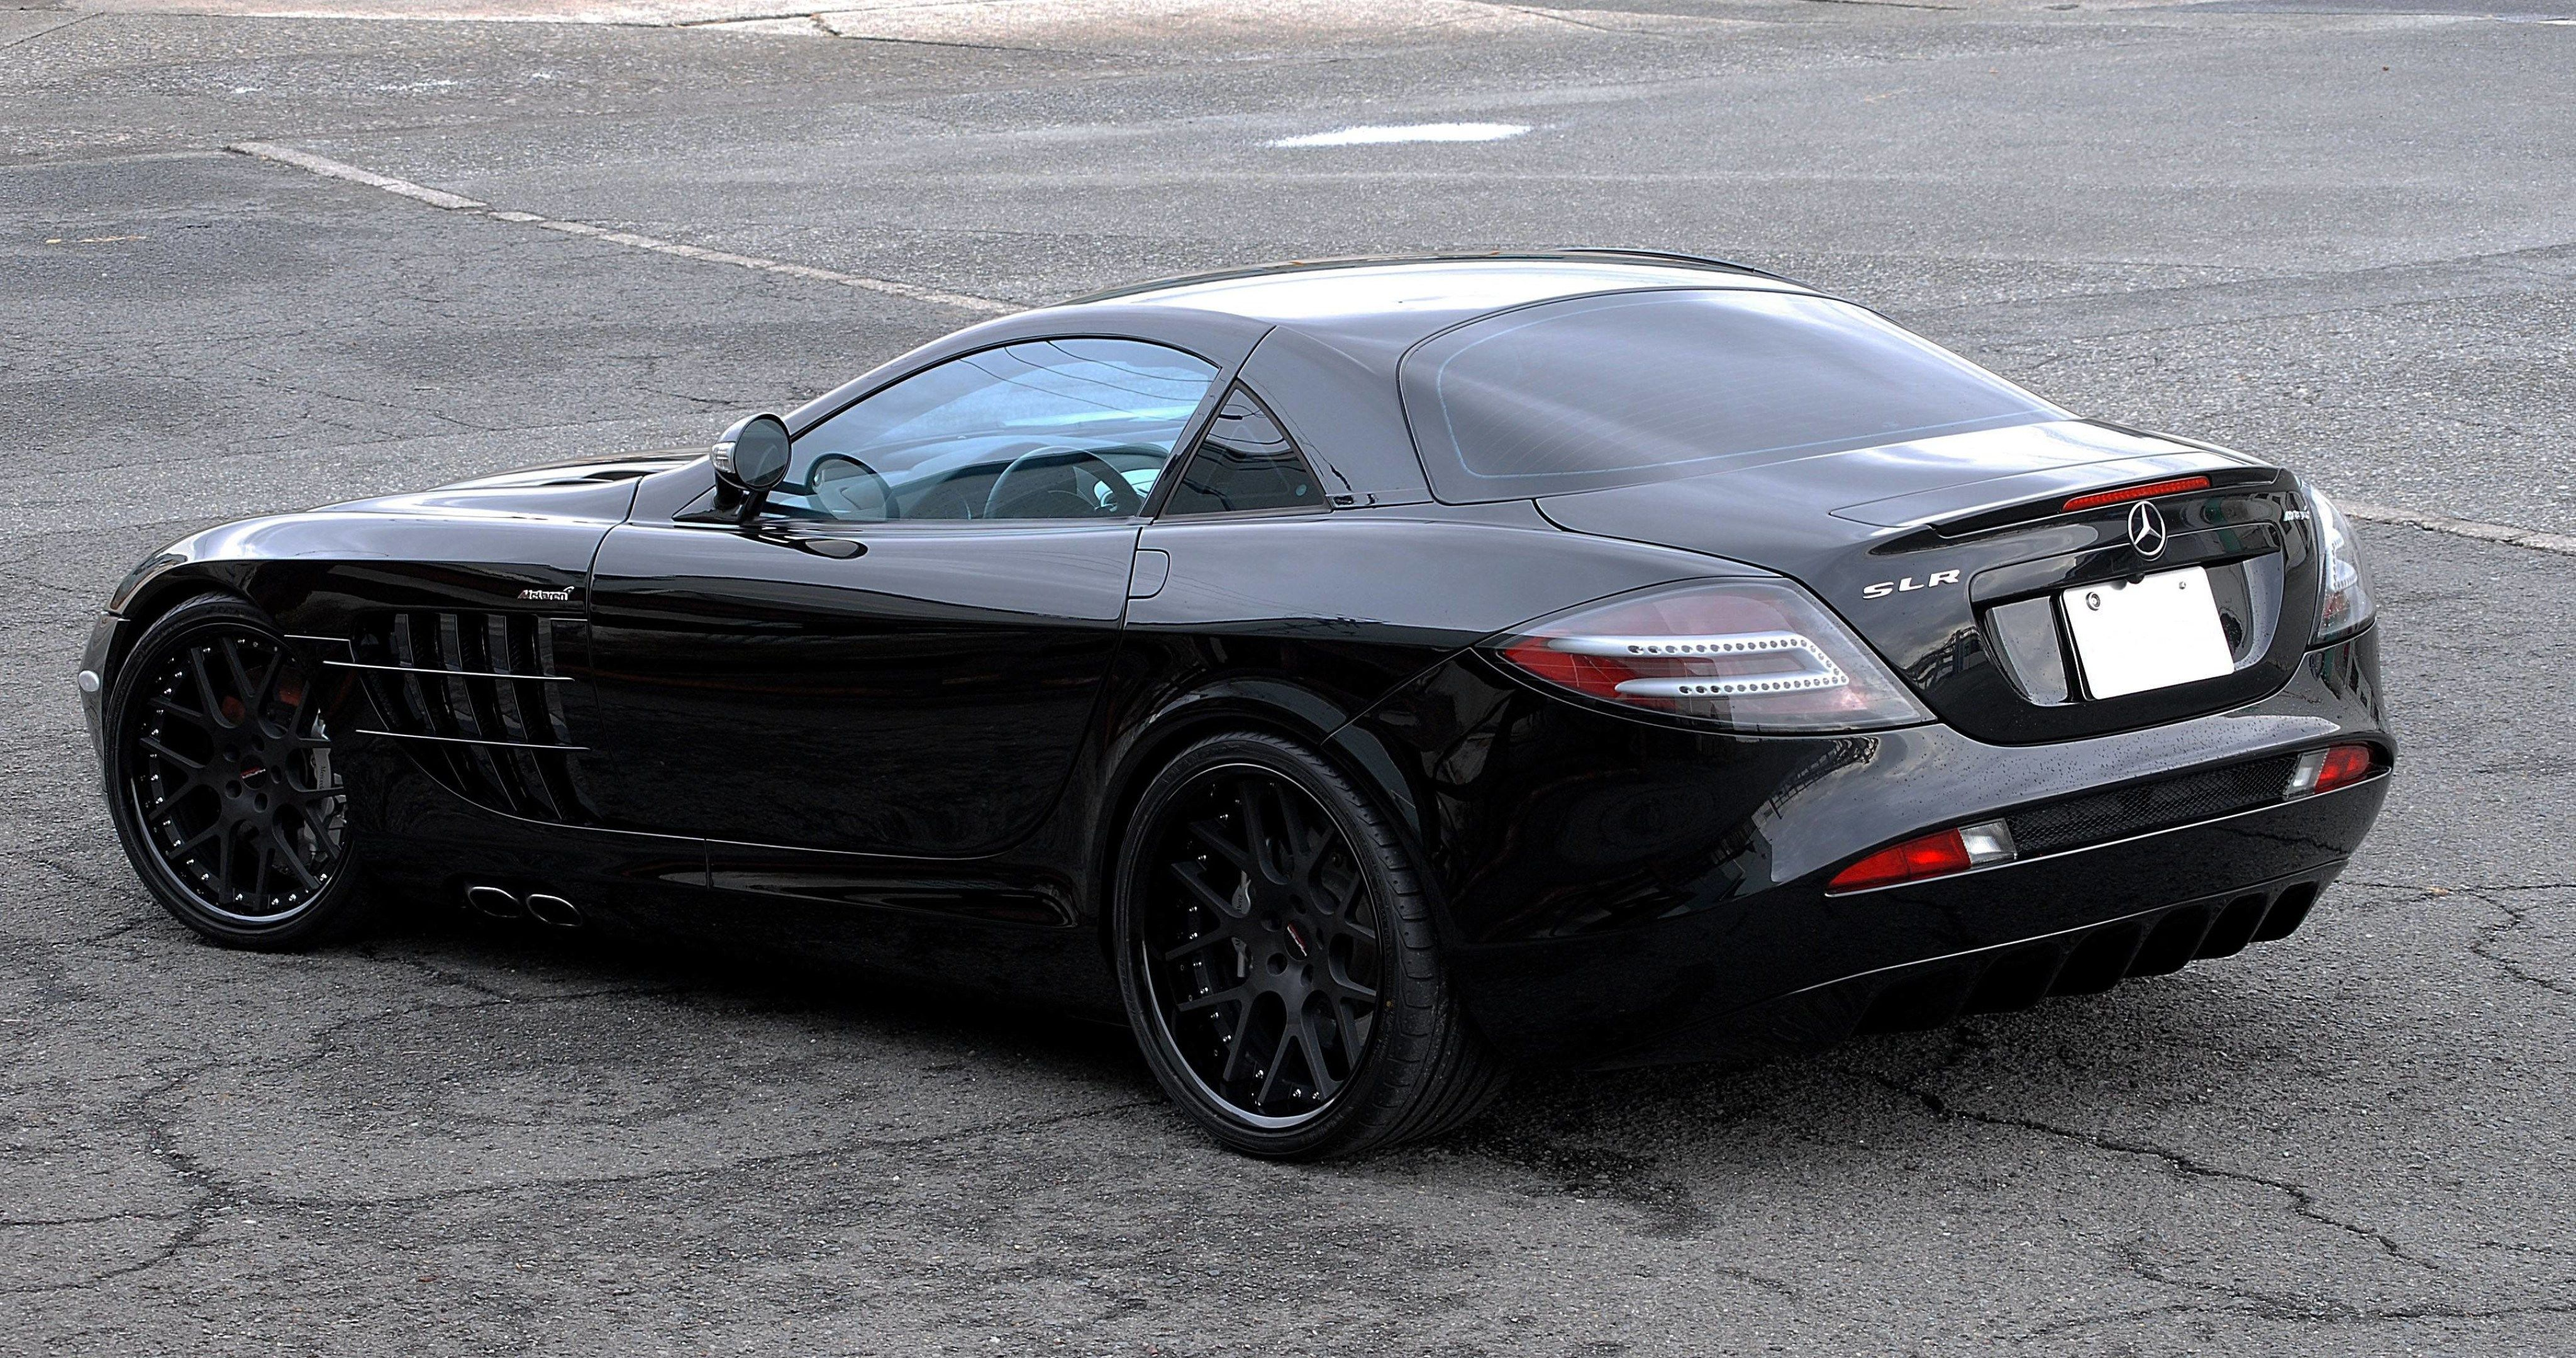 Mercedes Benz Slr Mclaren Black 4k Ultra Hd Wallpaper Ololoshenka